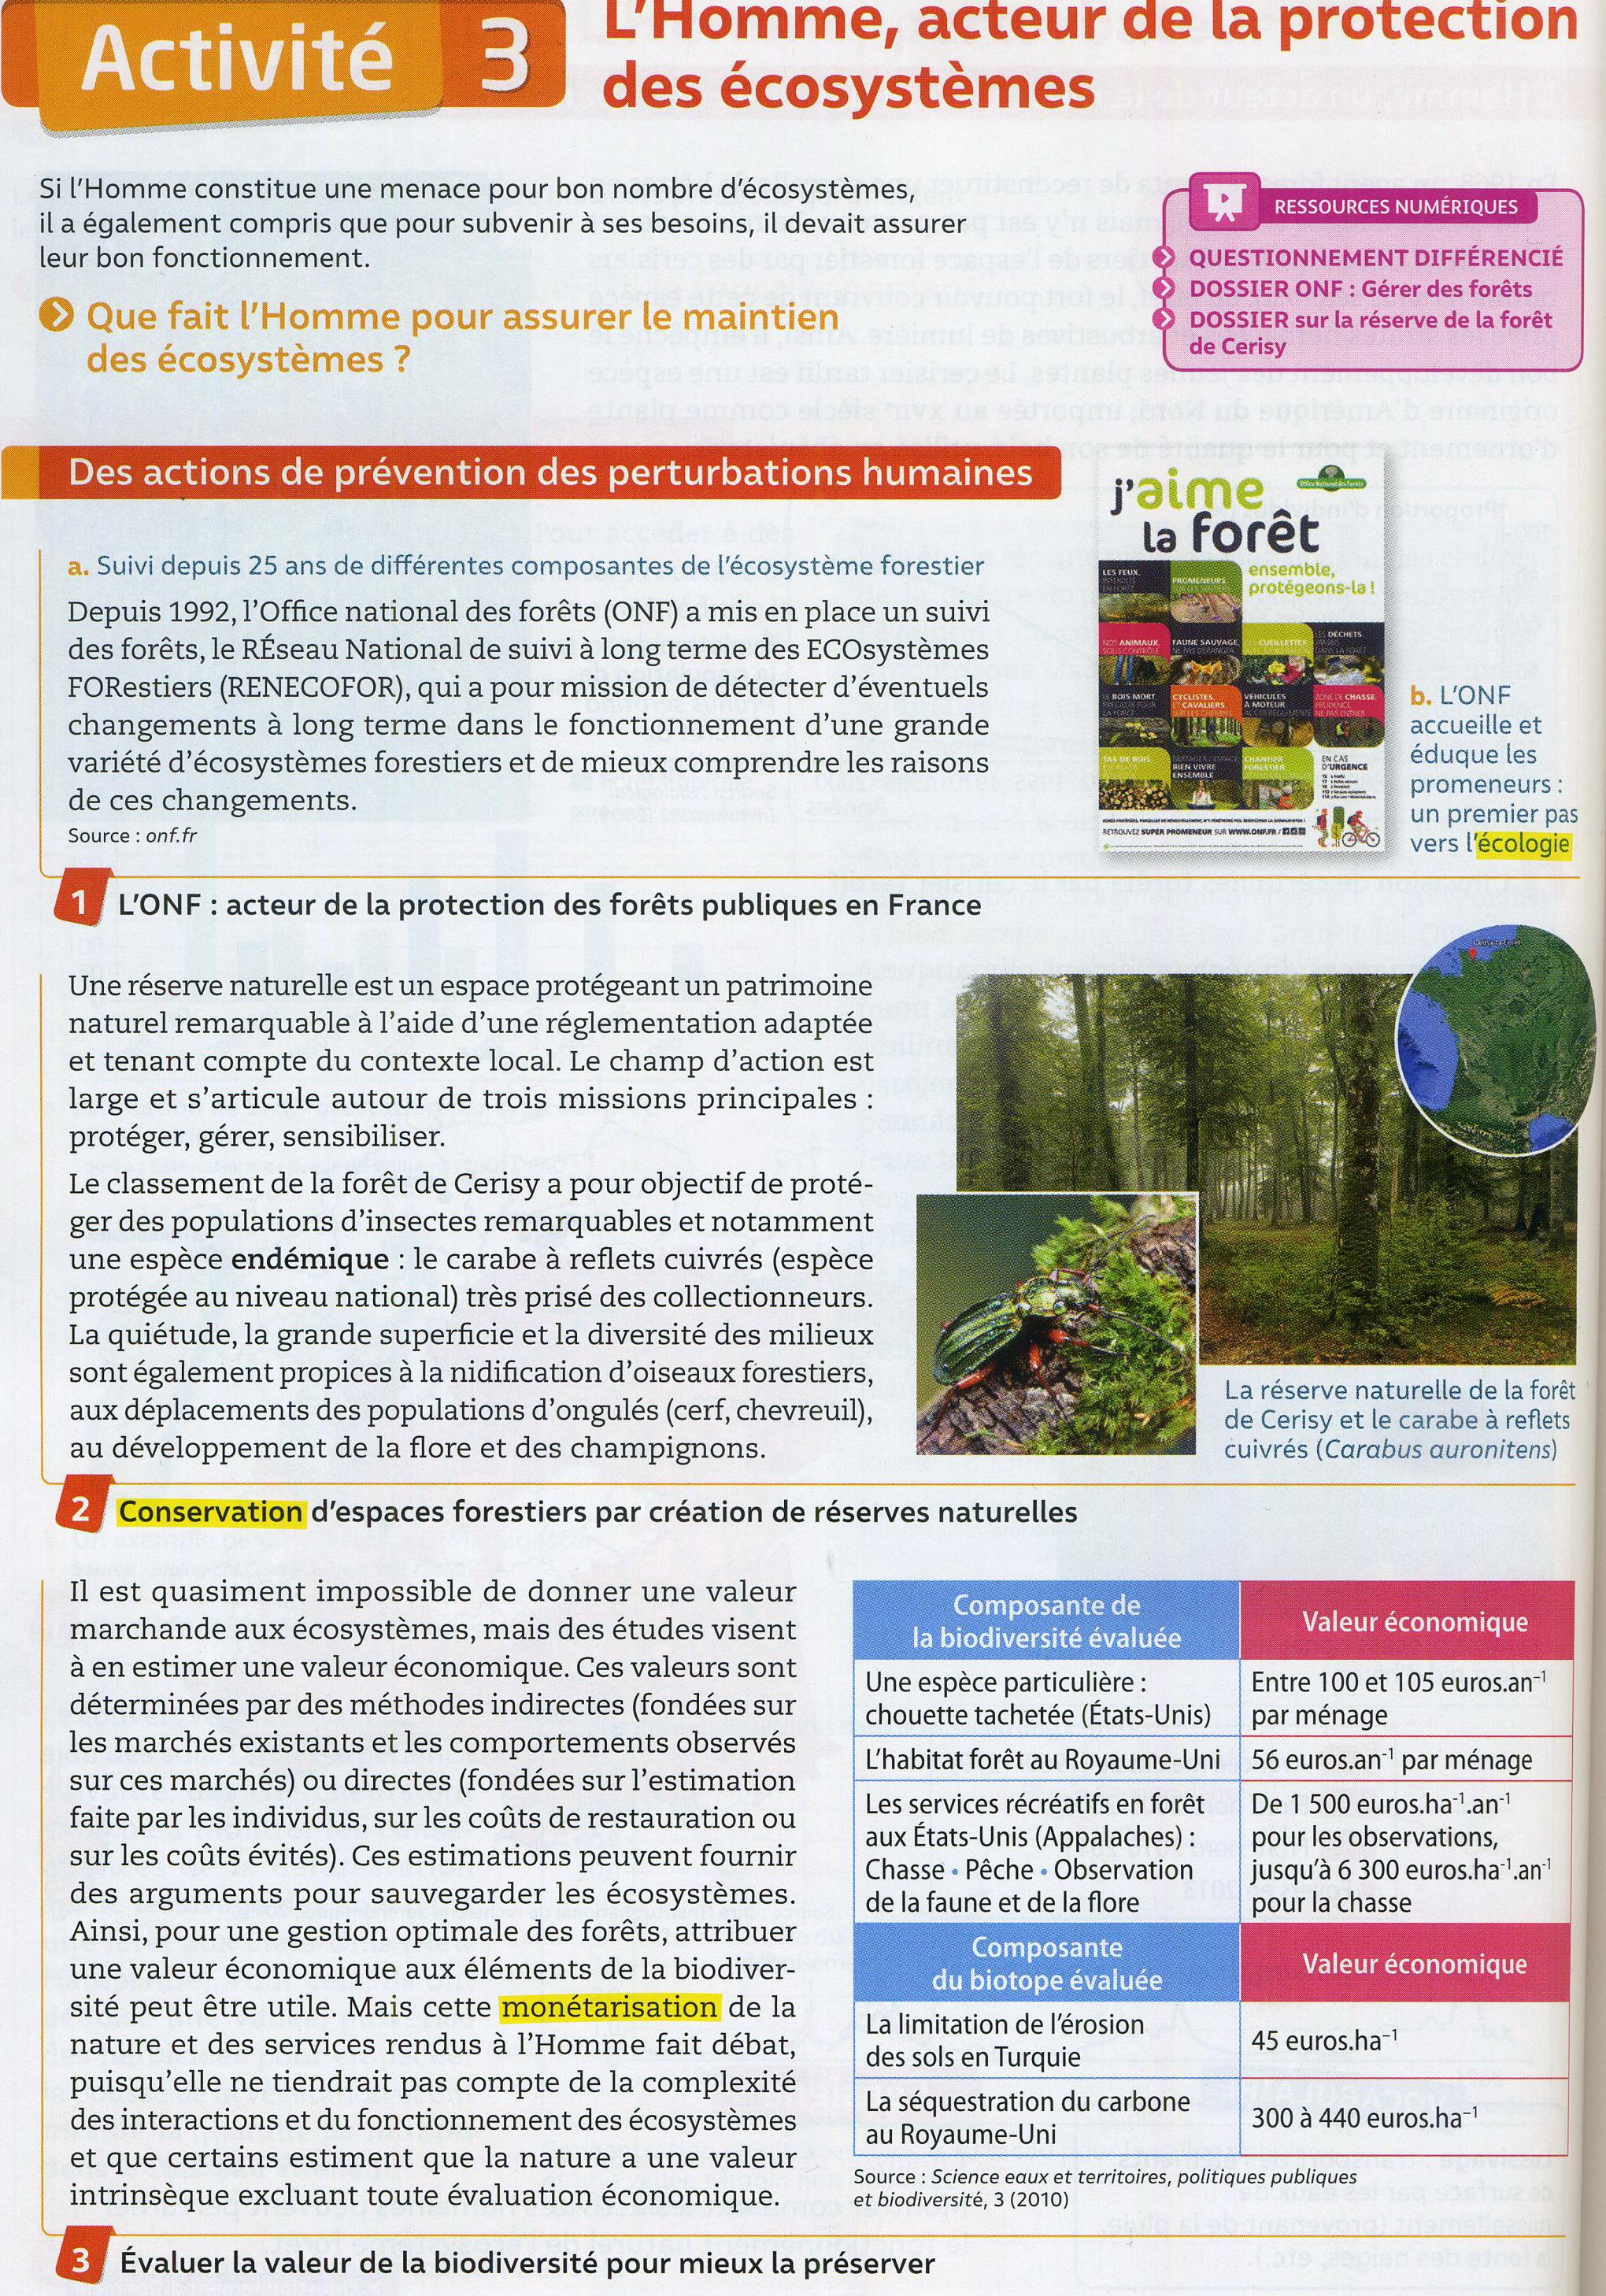 ACT 4 écosystème protection (1)